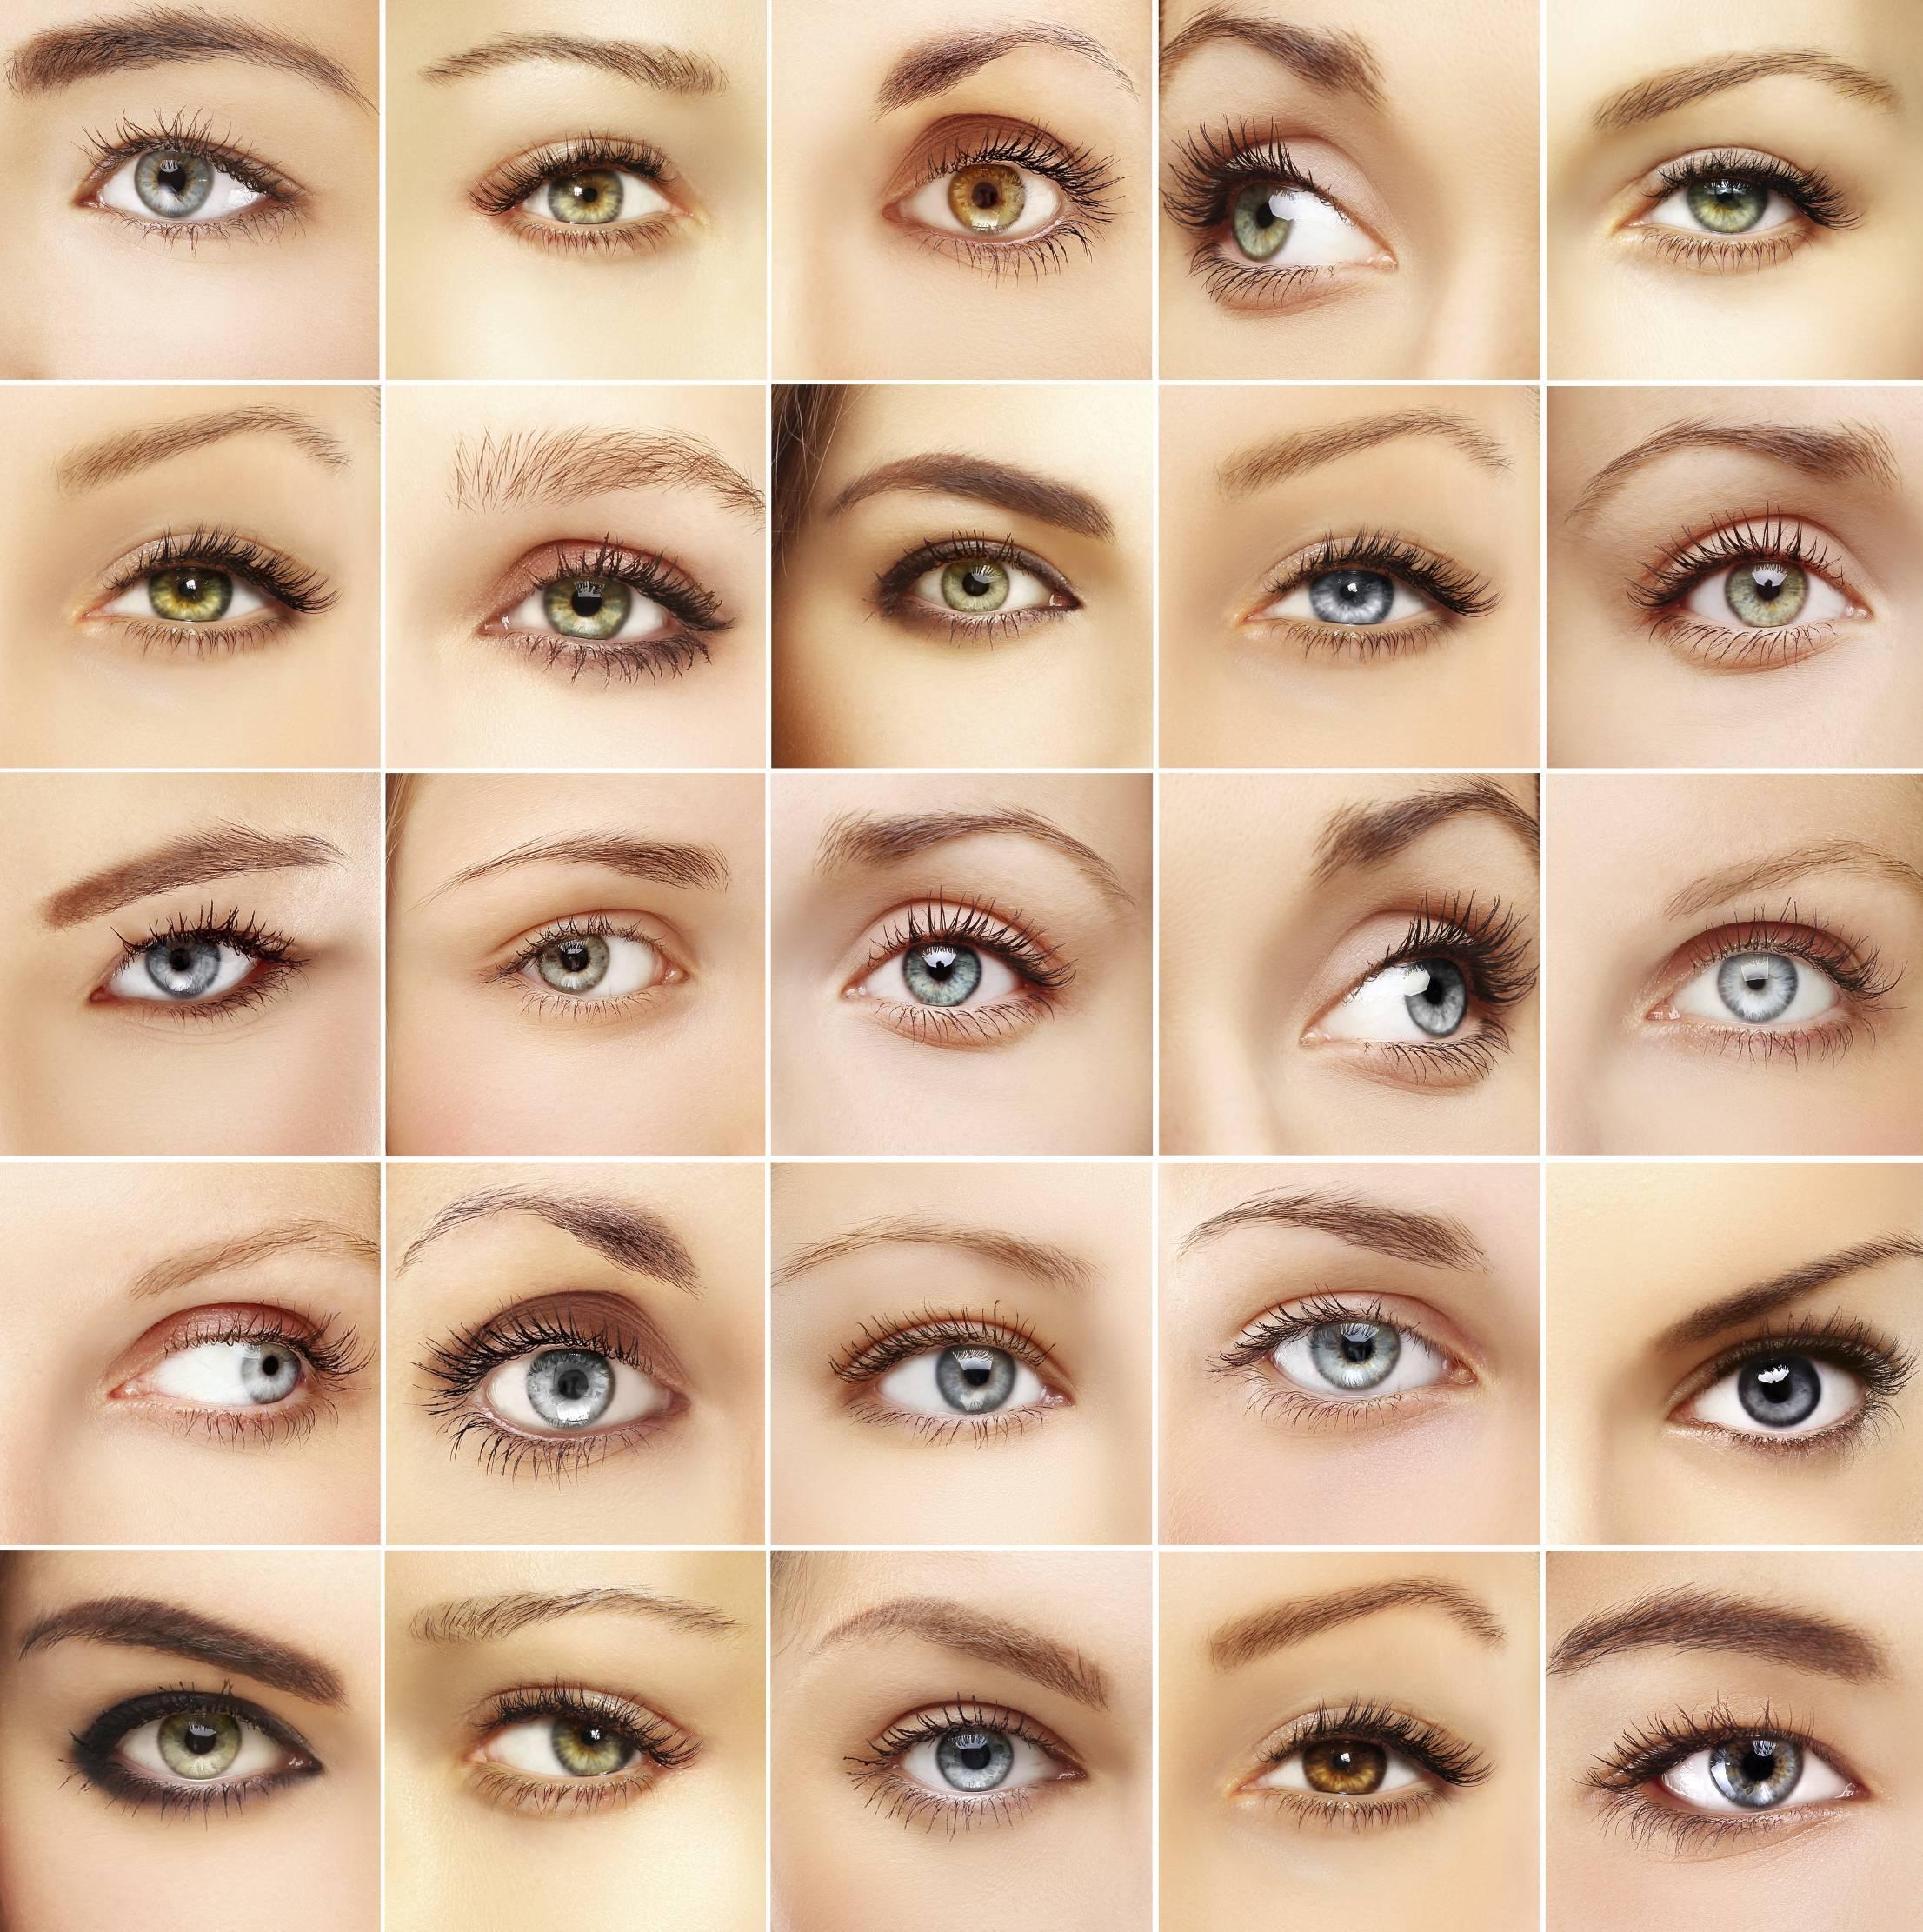 виды глаз человека